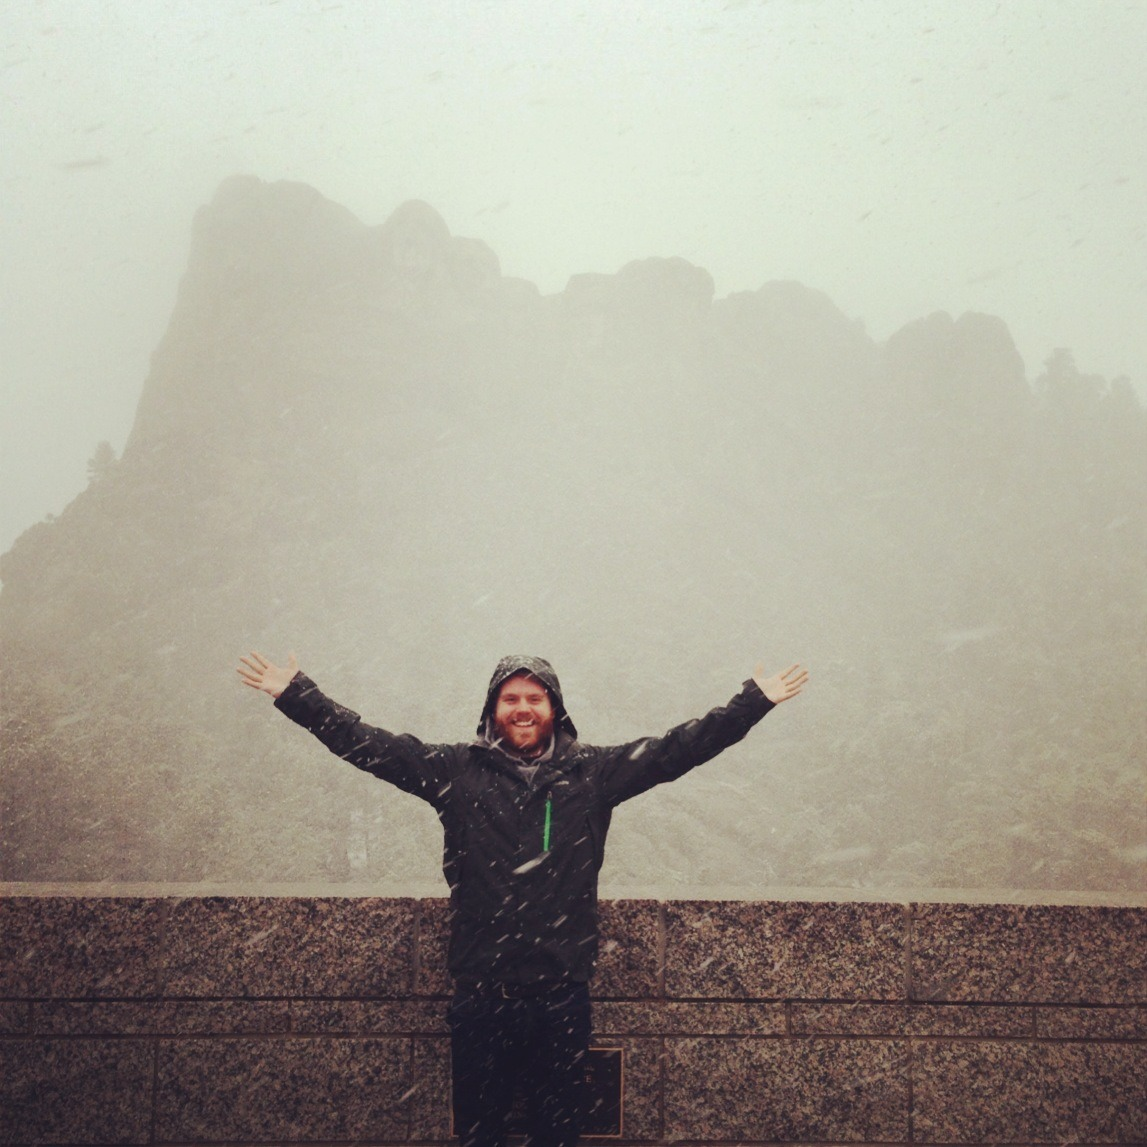 Mount Rushmore??!